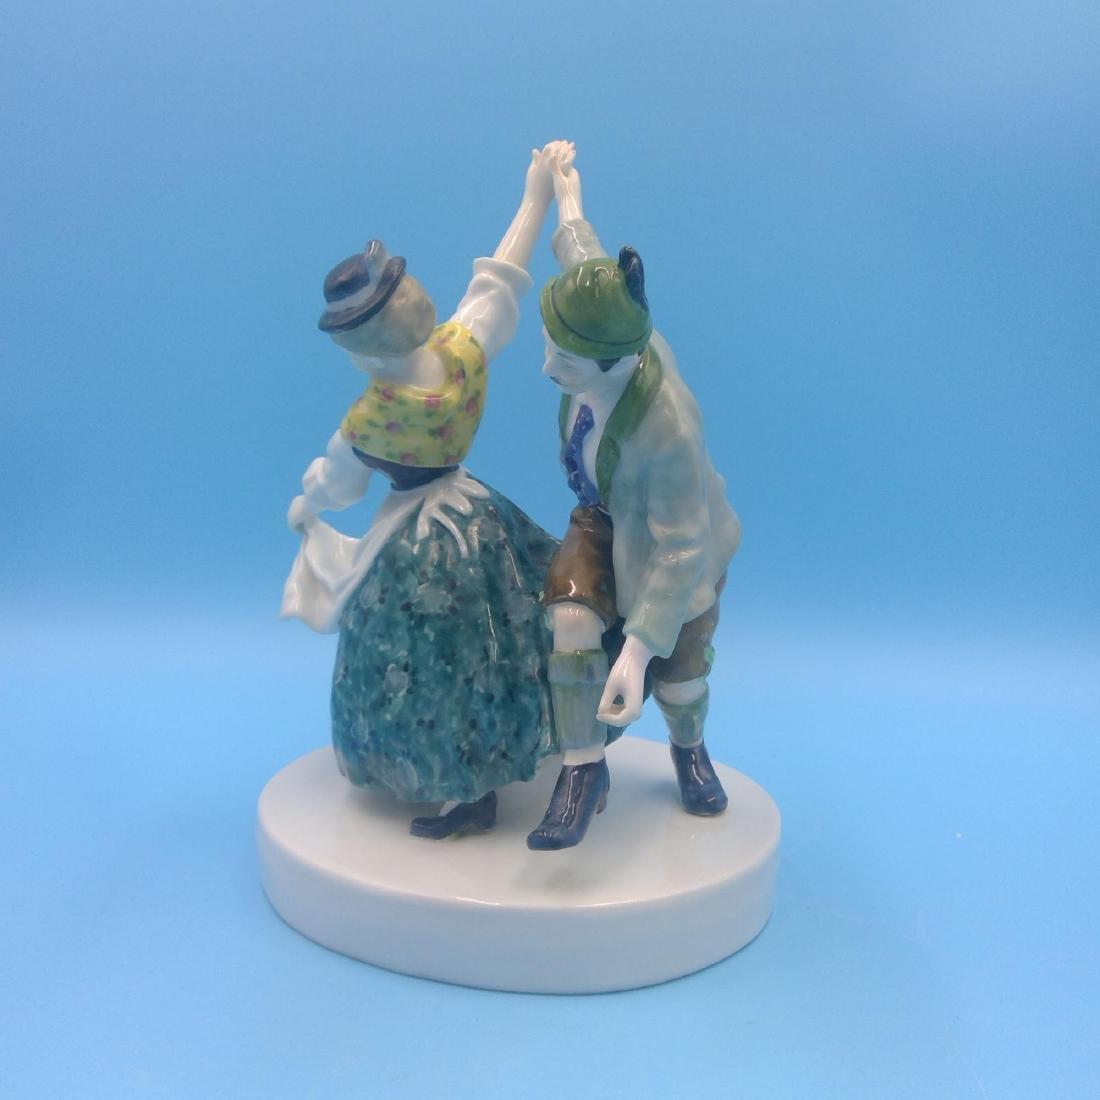 KARL ENS GERMAN PORCELAIN FIGURINE DANCING COUPLE - 2